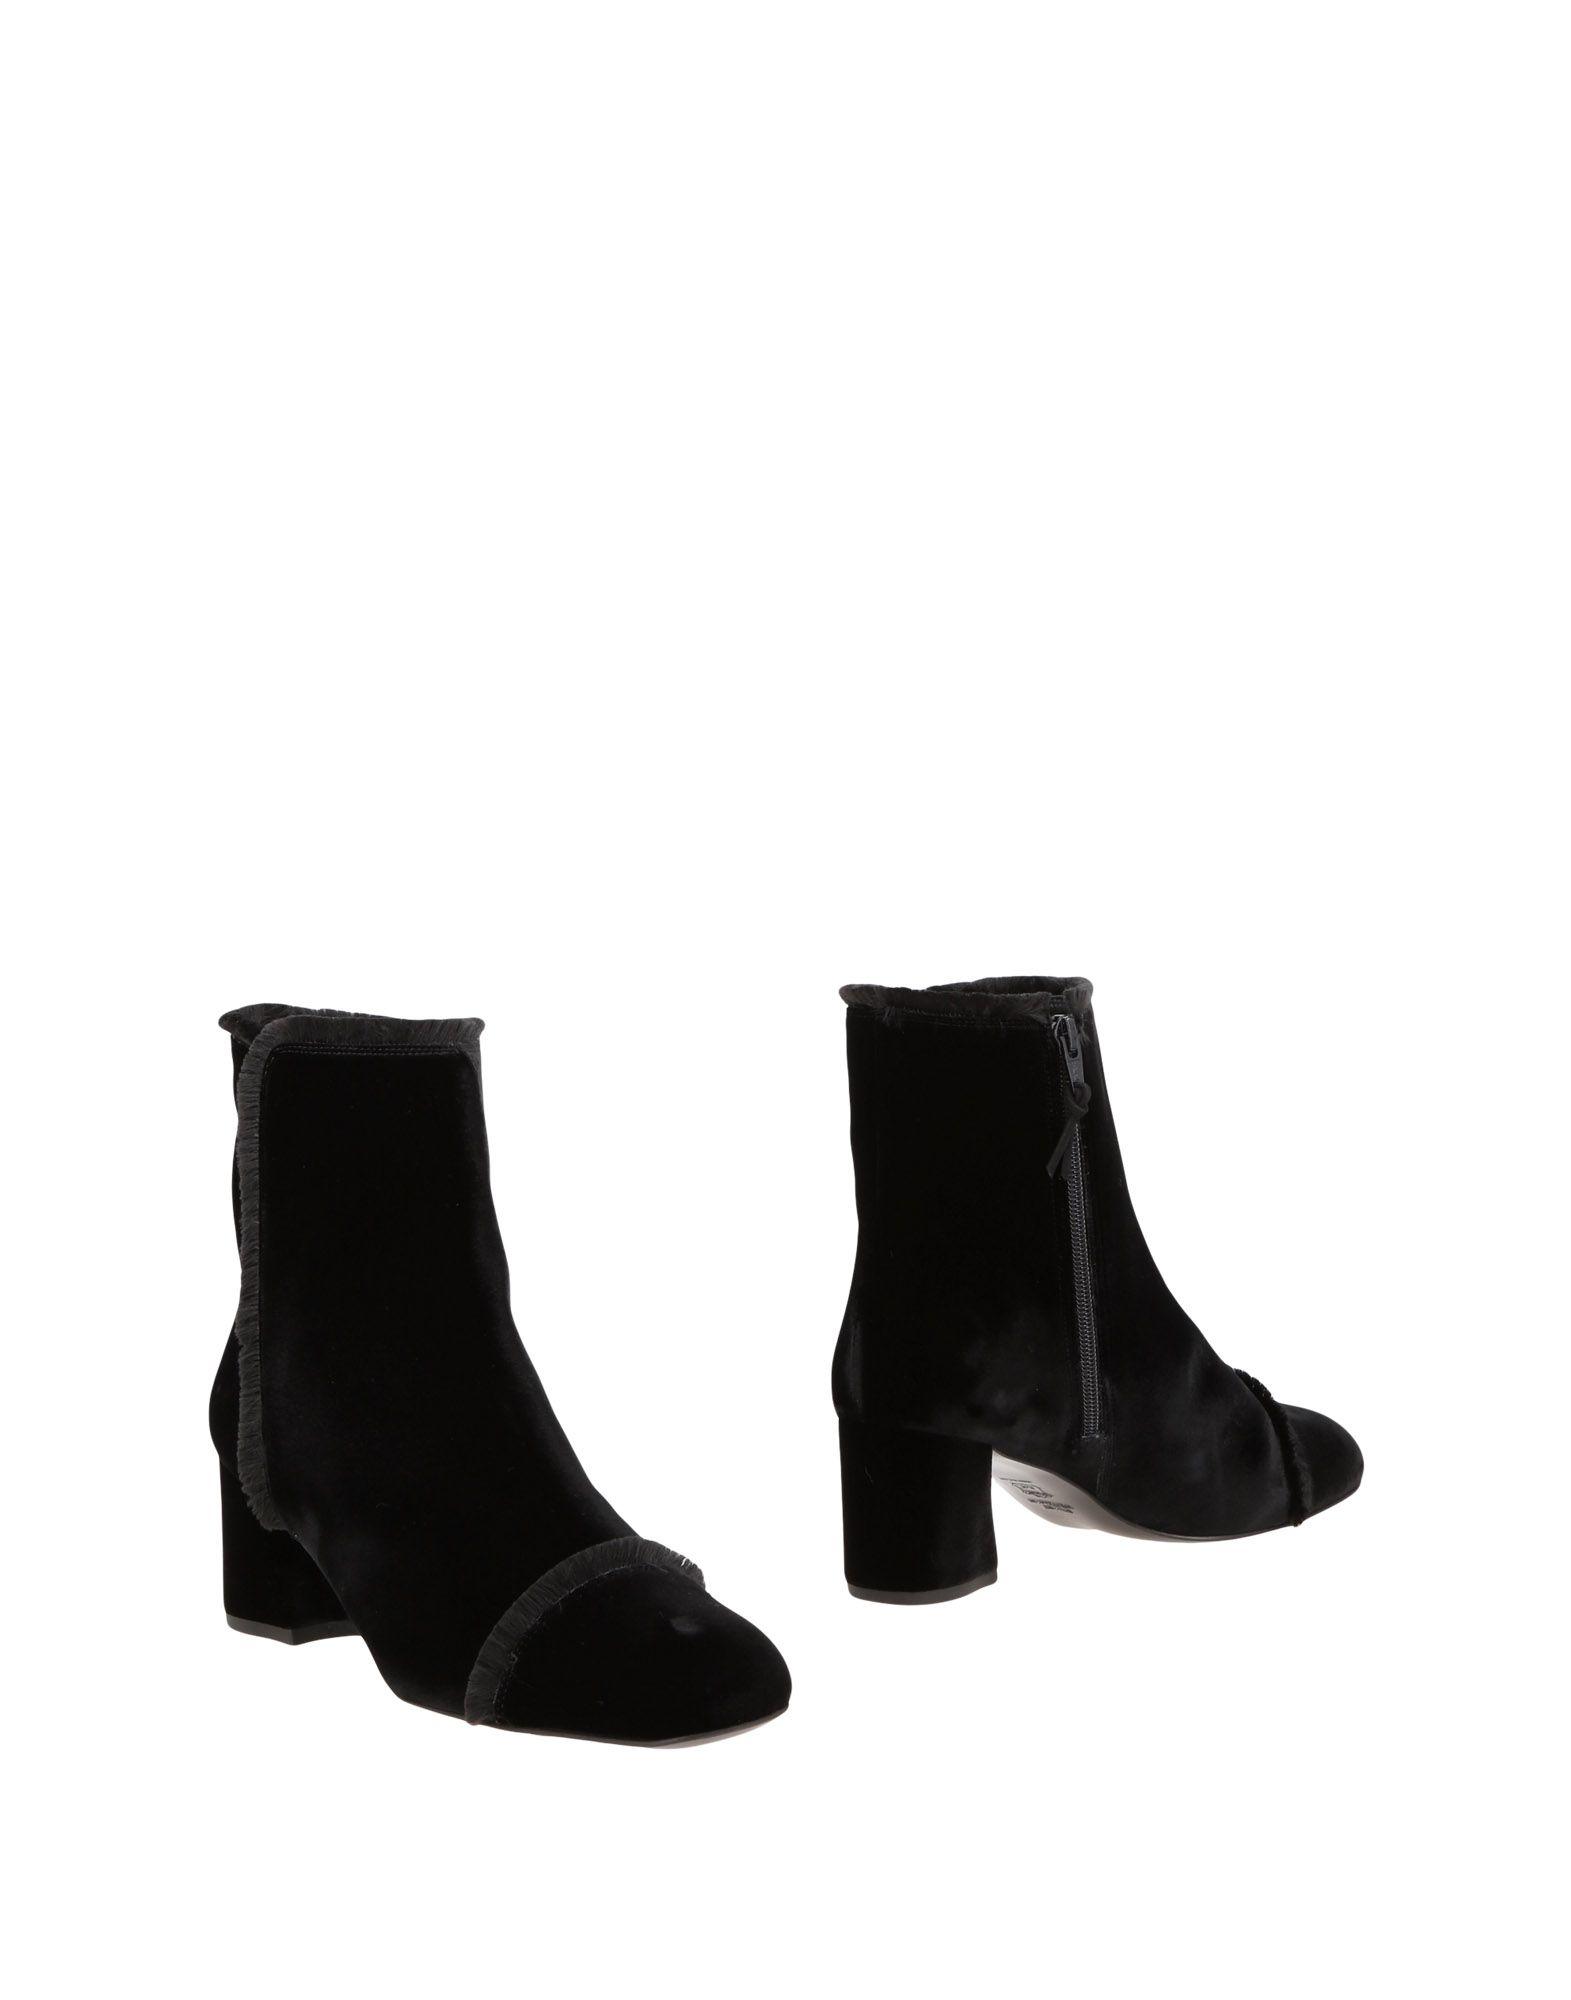 Bottine Stuart Weitzman Femme - Bottines Stuart Weitzman Noir Chaussures casual sauvages